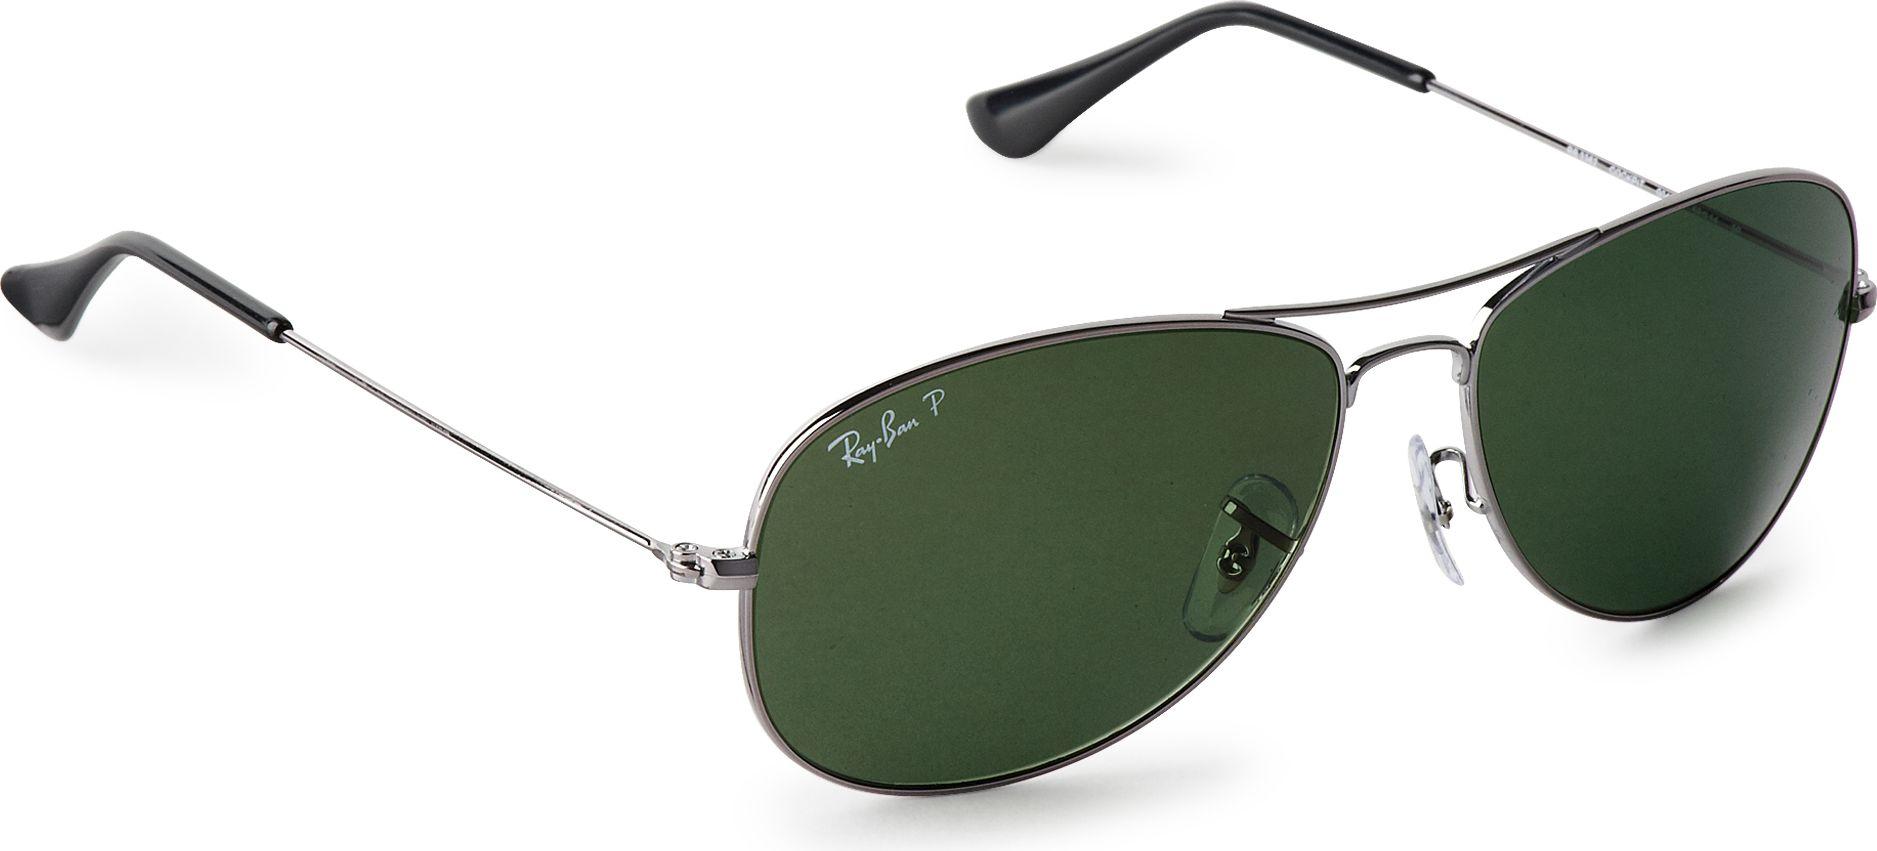 sunglasses ray ban for men aviator